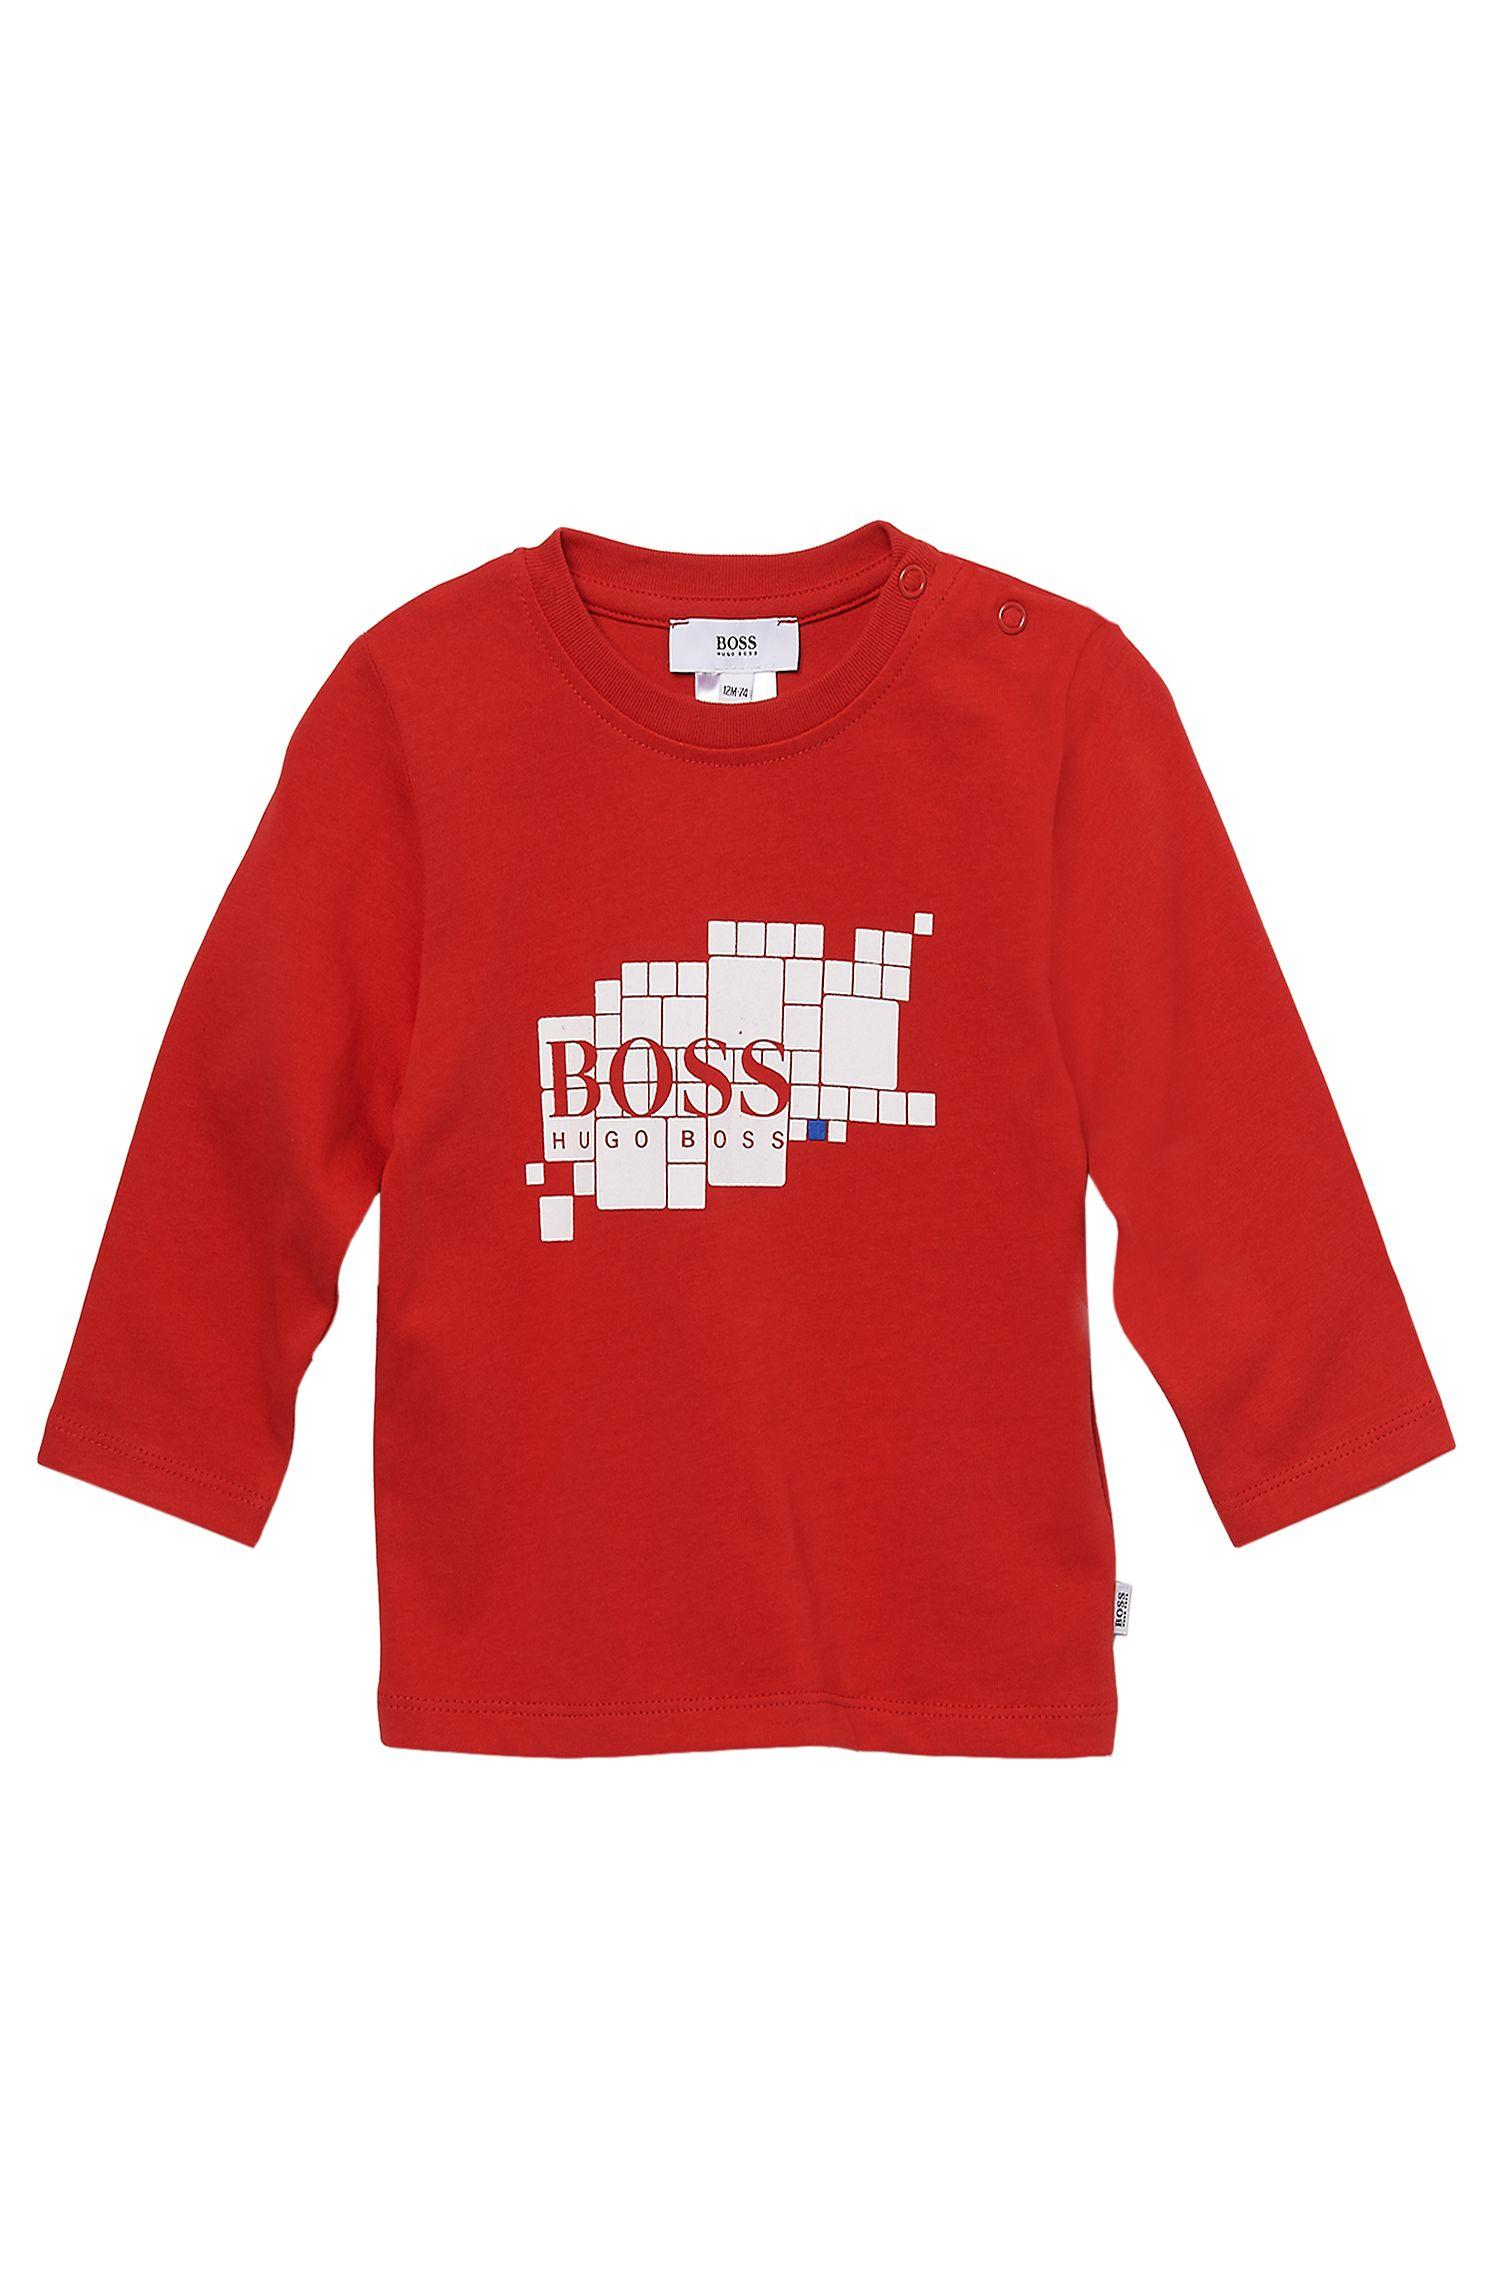 'J05249' | Toddler Long-Sleeved Cotton Print Crewneck T-Shirt